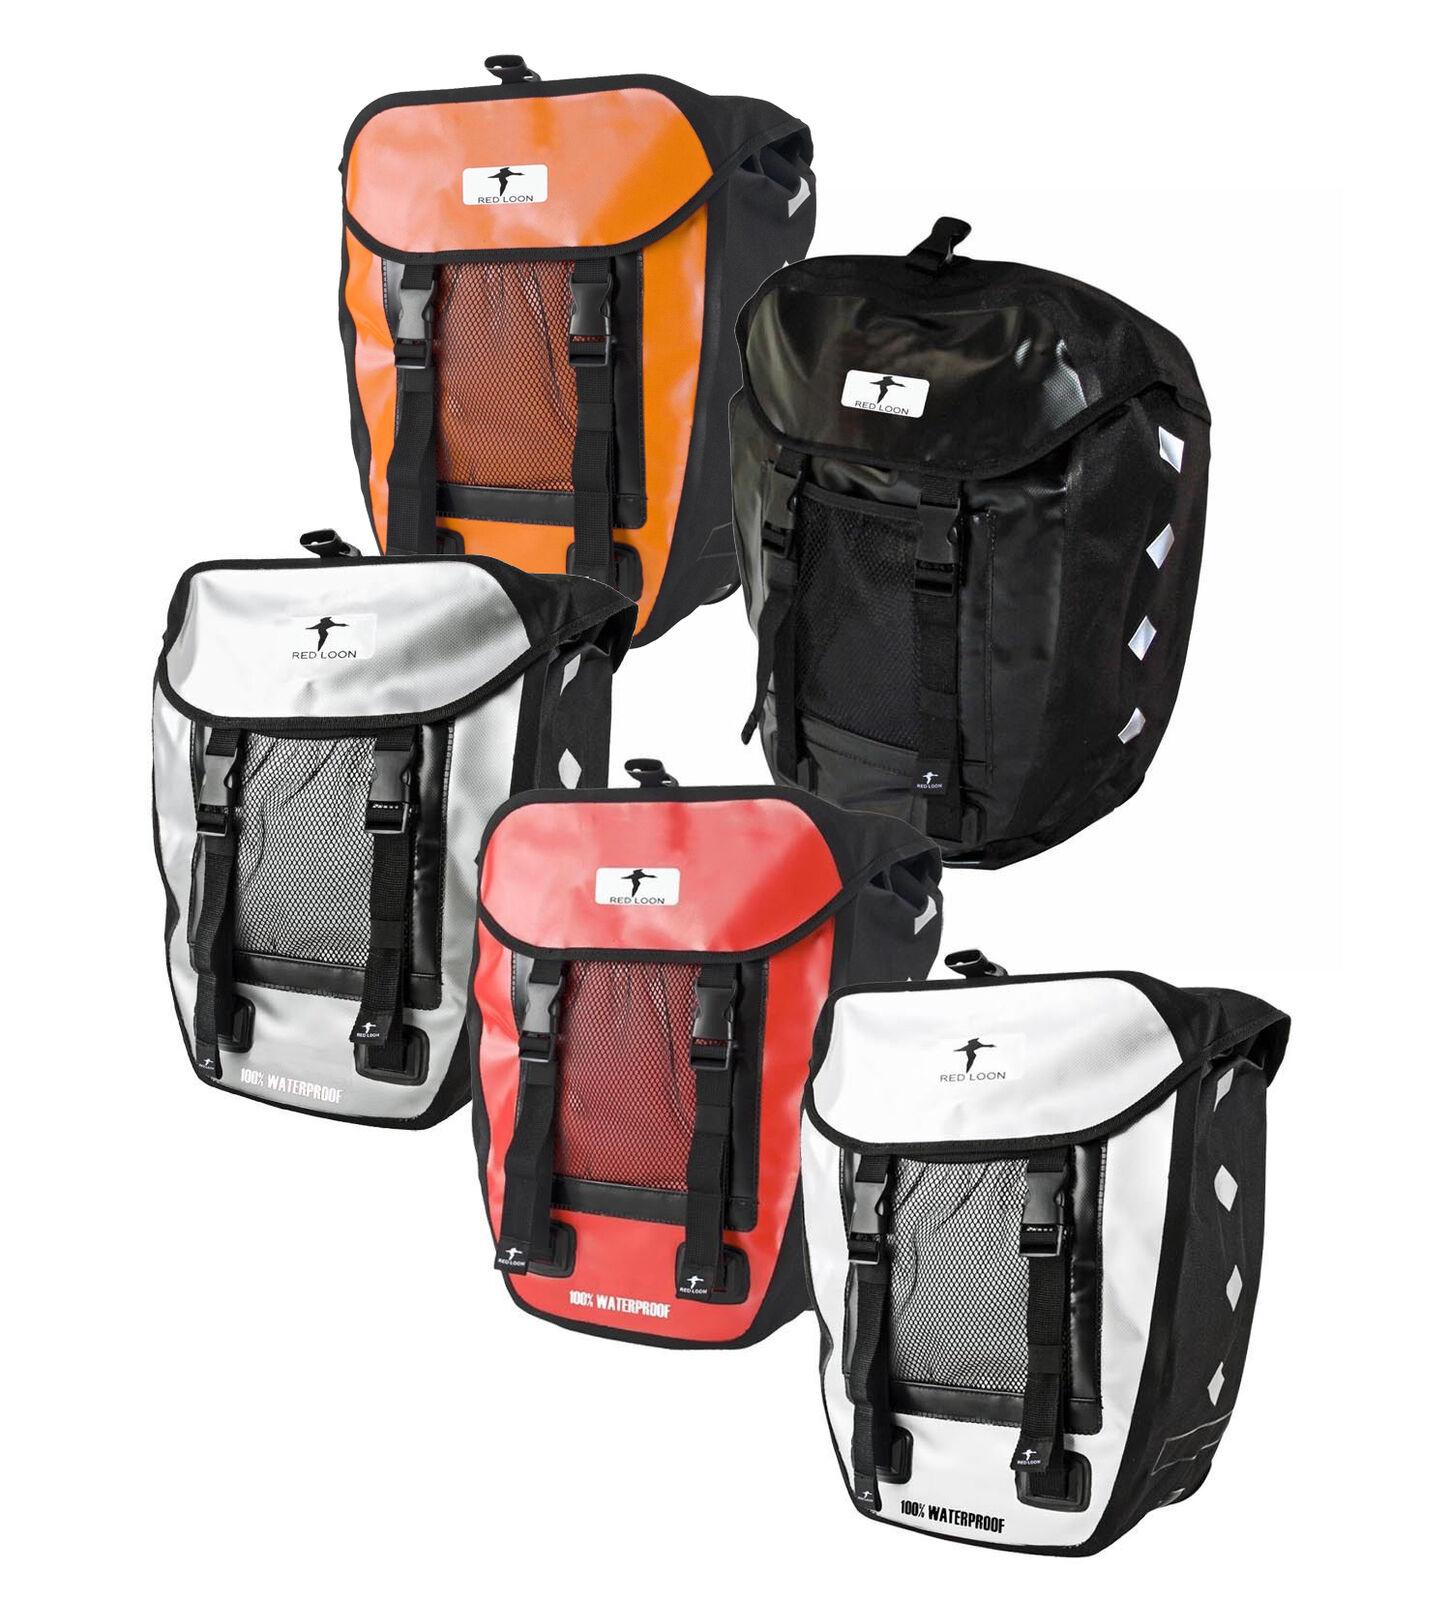 Gepäckträgertasche Fahrrad Tasche Packtasche wasserdicht Fahrradtasche Bag 01